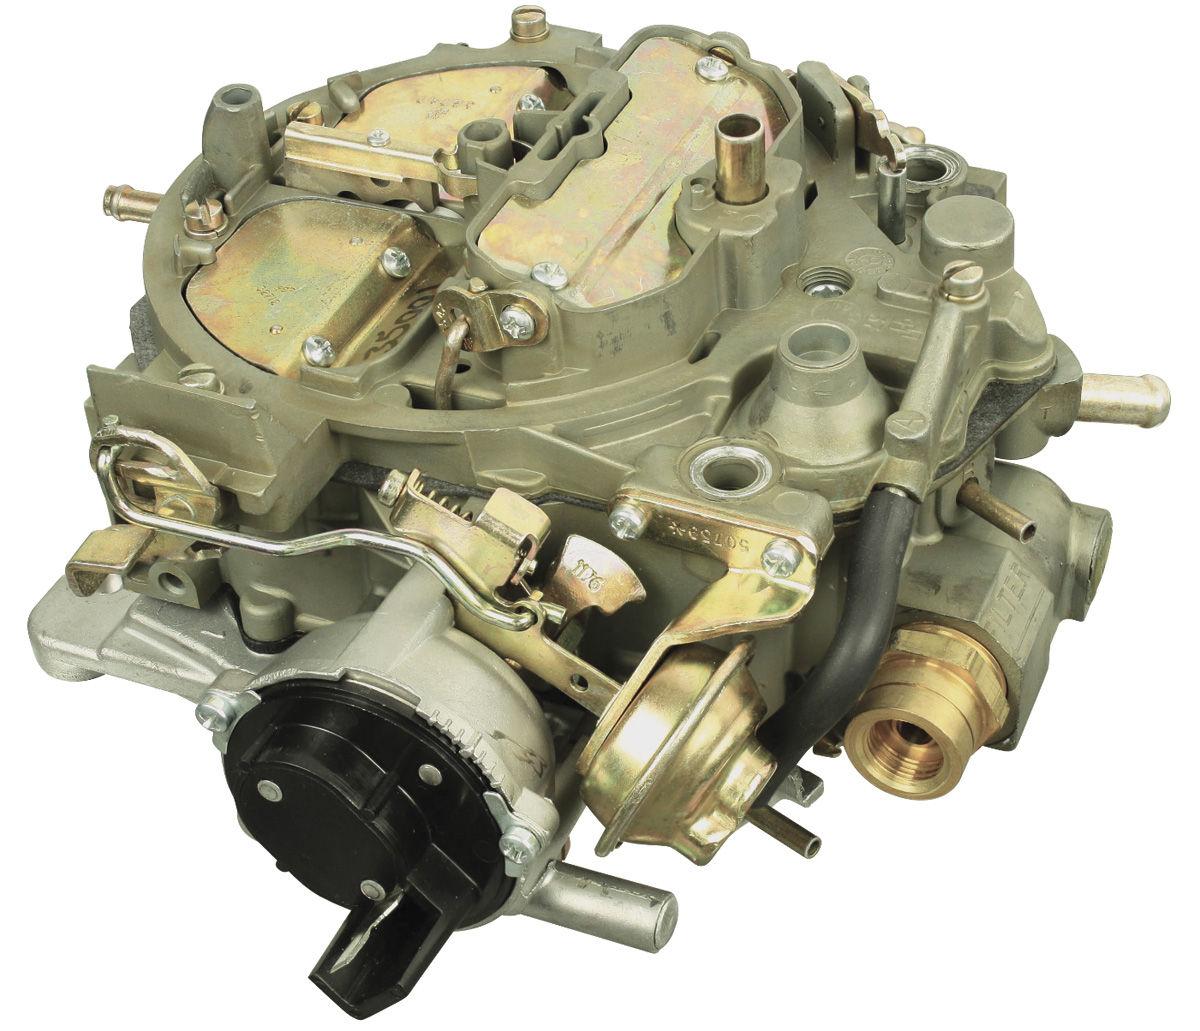 Carburetor, Quadrajet, SMI, 1967-76 Buick Riviera Streetmaster, Stage 2